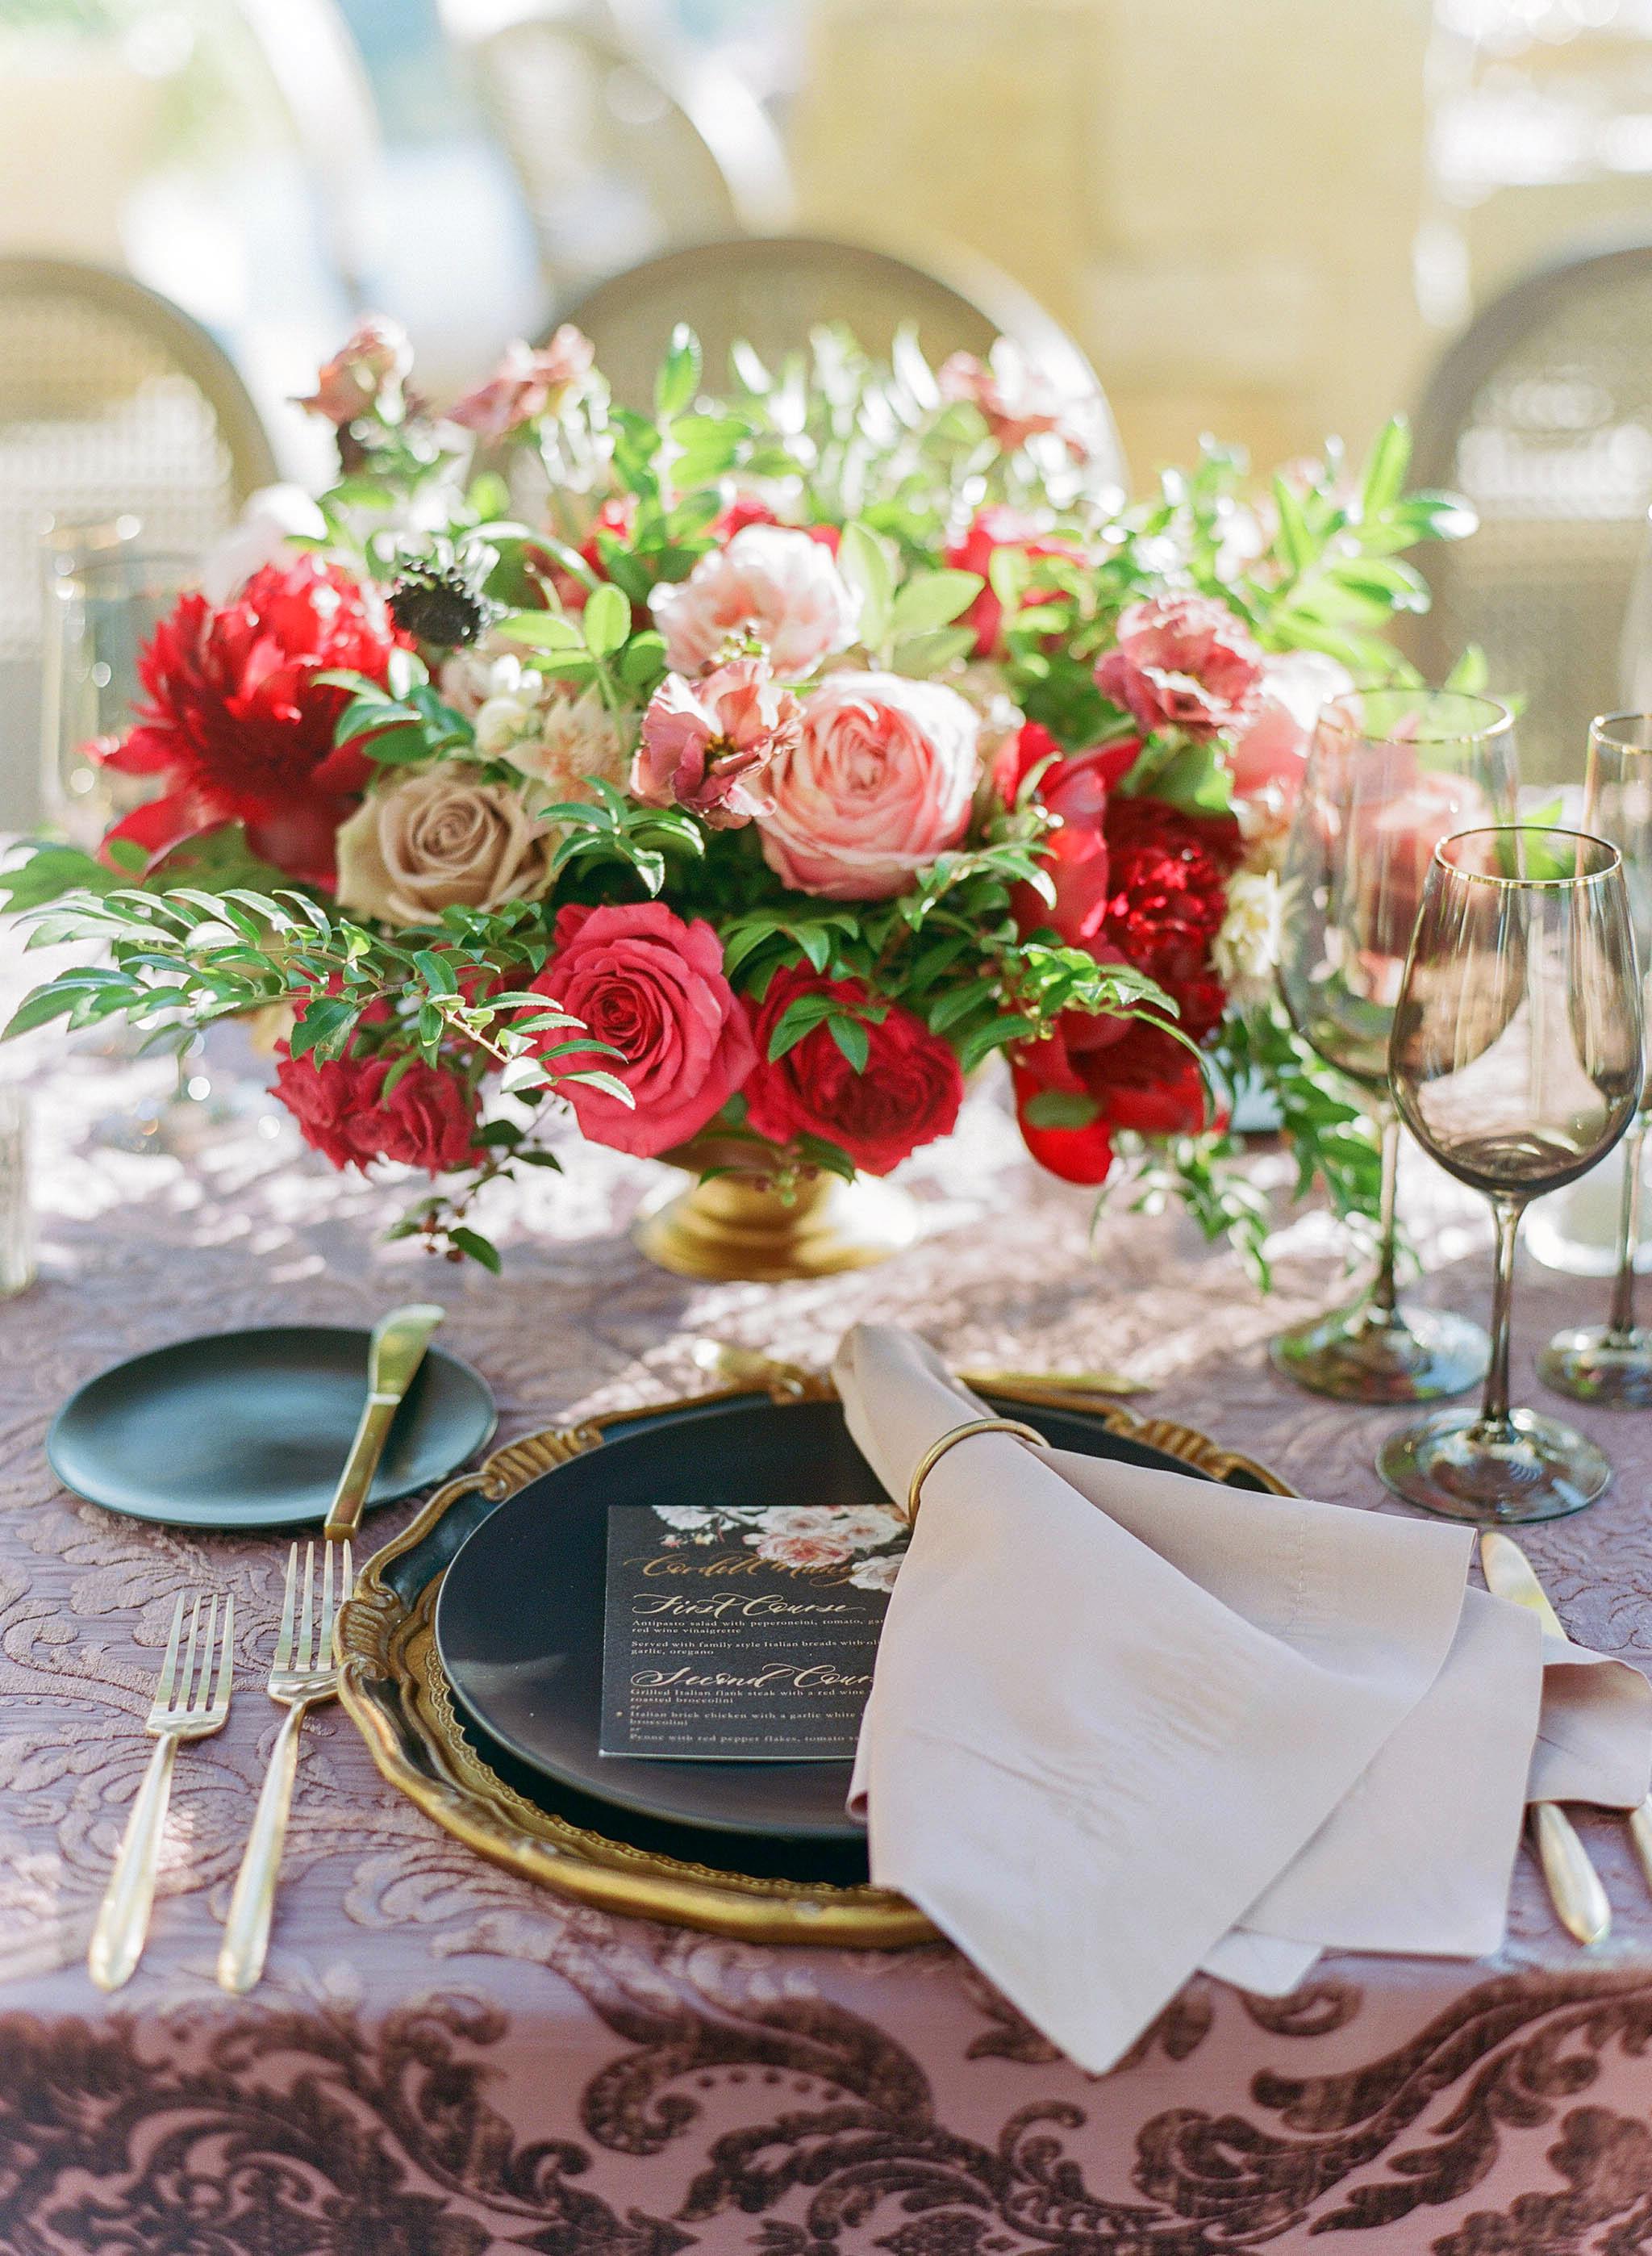 tillie dalton wedding reception table setting